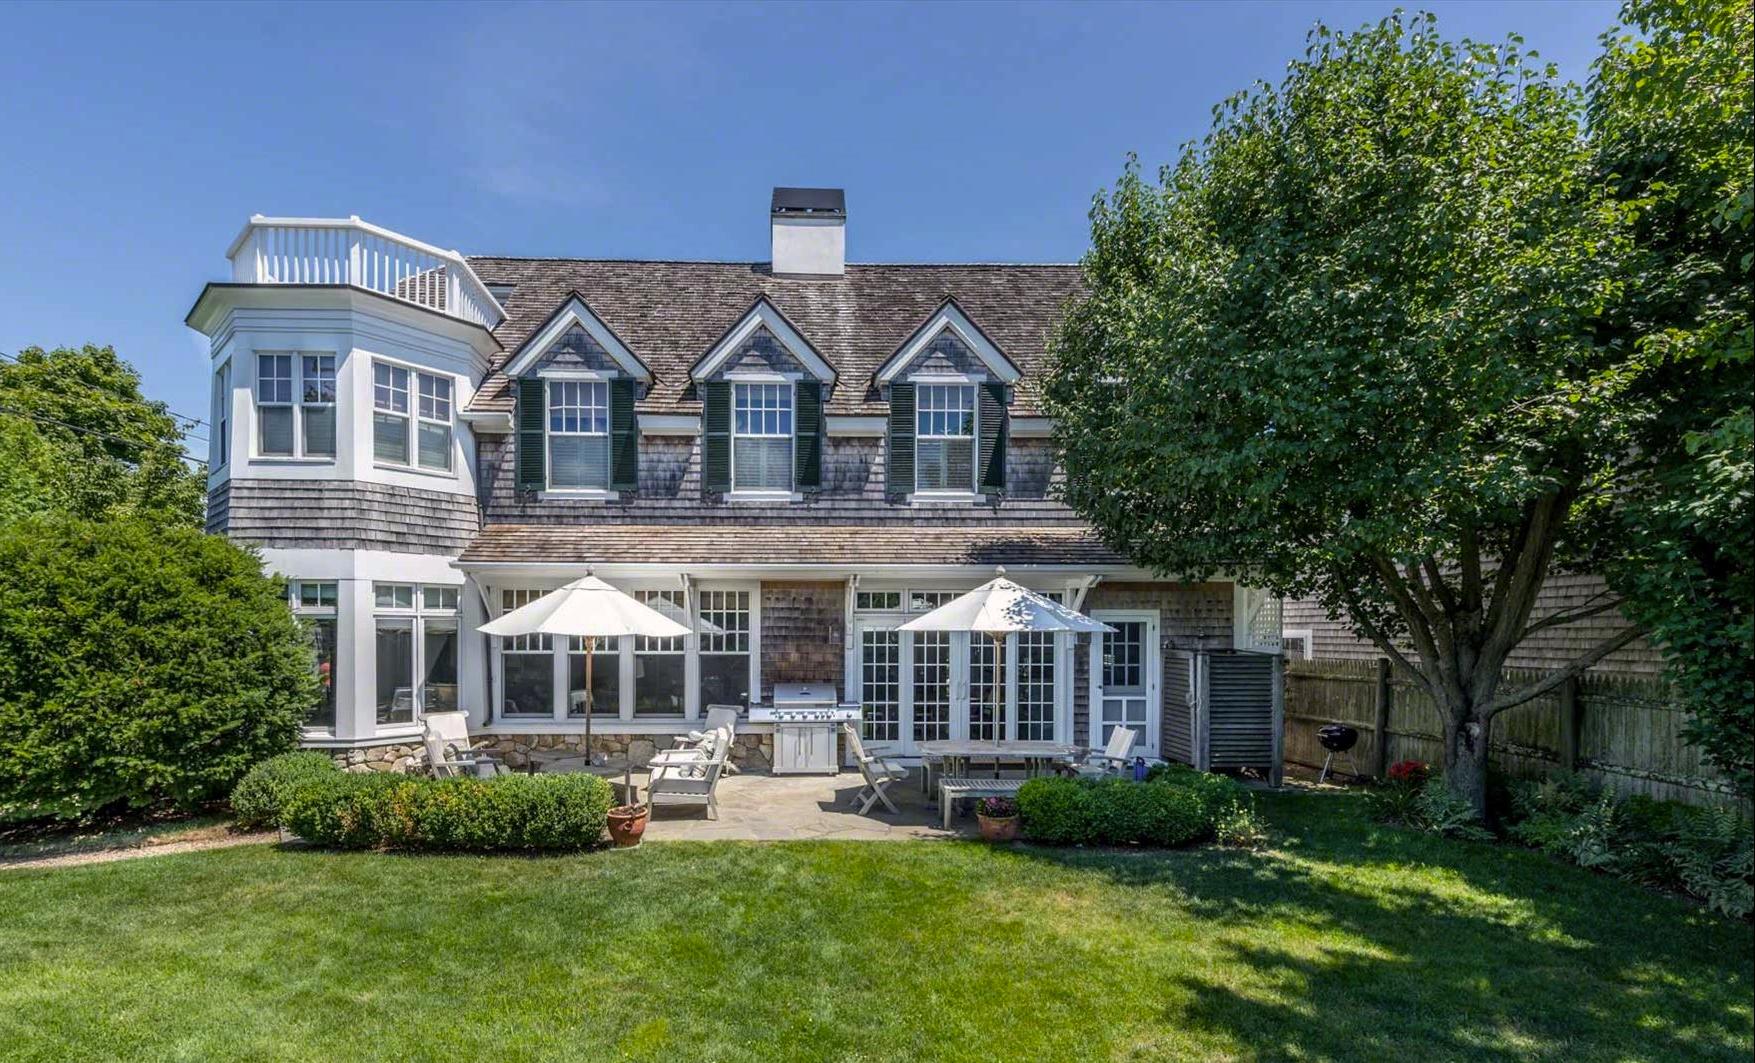 Shingle_Style_Colonial_Island_Architecture_Dormers_Yard_Lawn.jpg